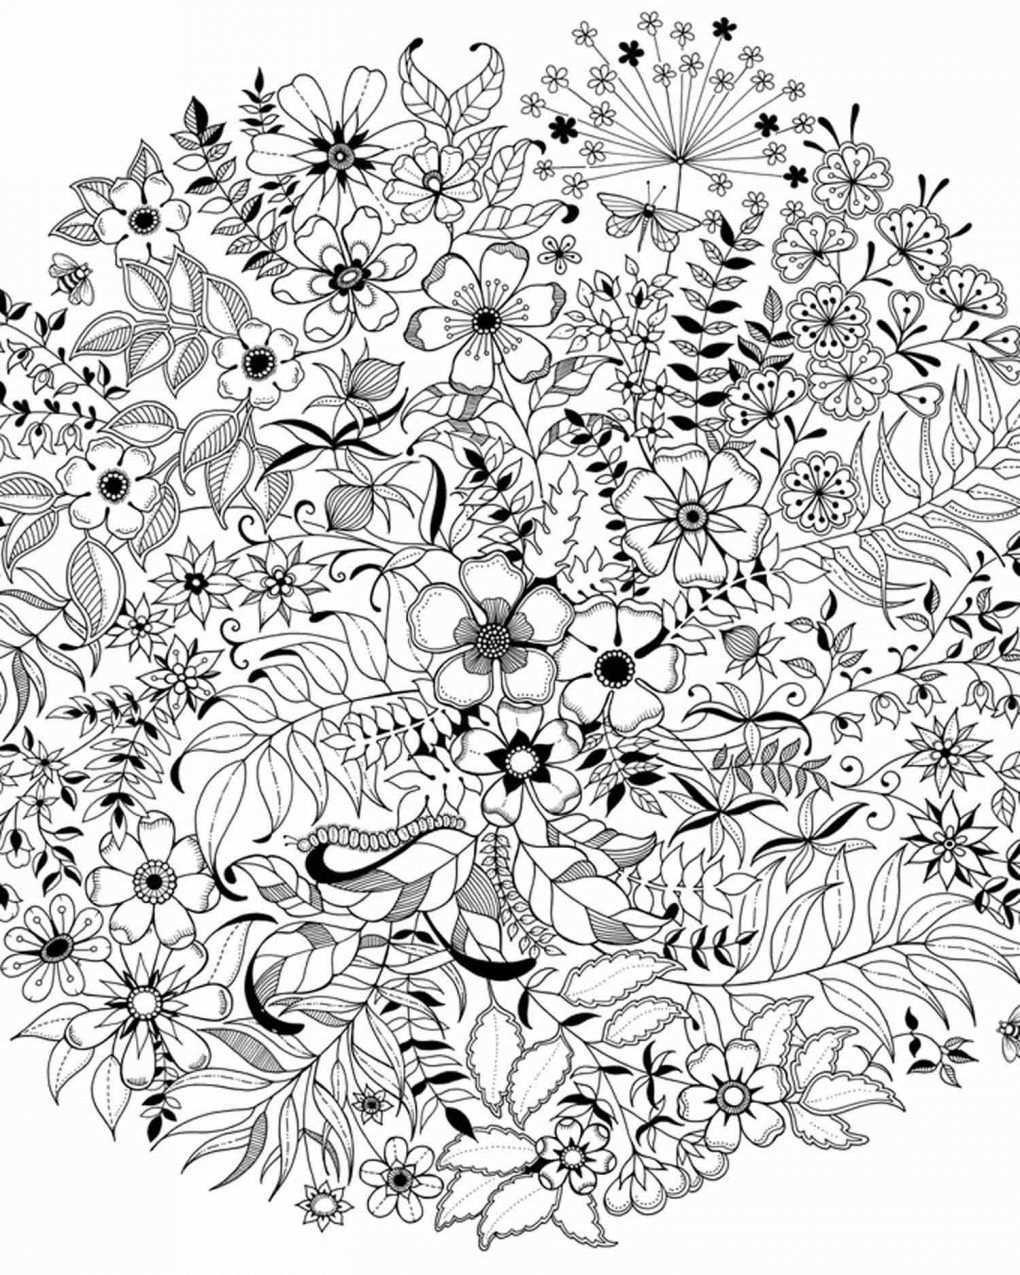 Secret Garden Coloring Pages Garden Charming Garden Decorating Plans With Garden Coloring Pages Entitlementtrap Com Mandala Kleurplaten Kleurboek Kleurplaten